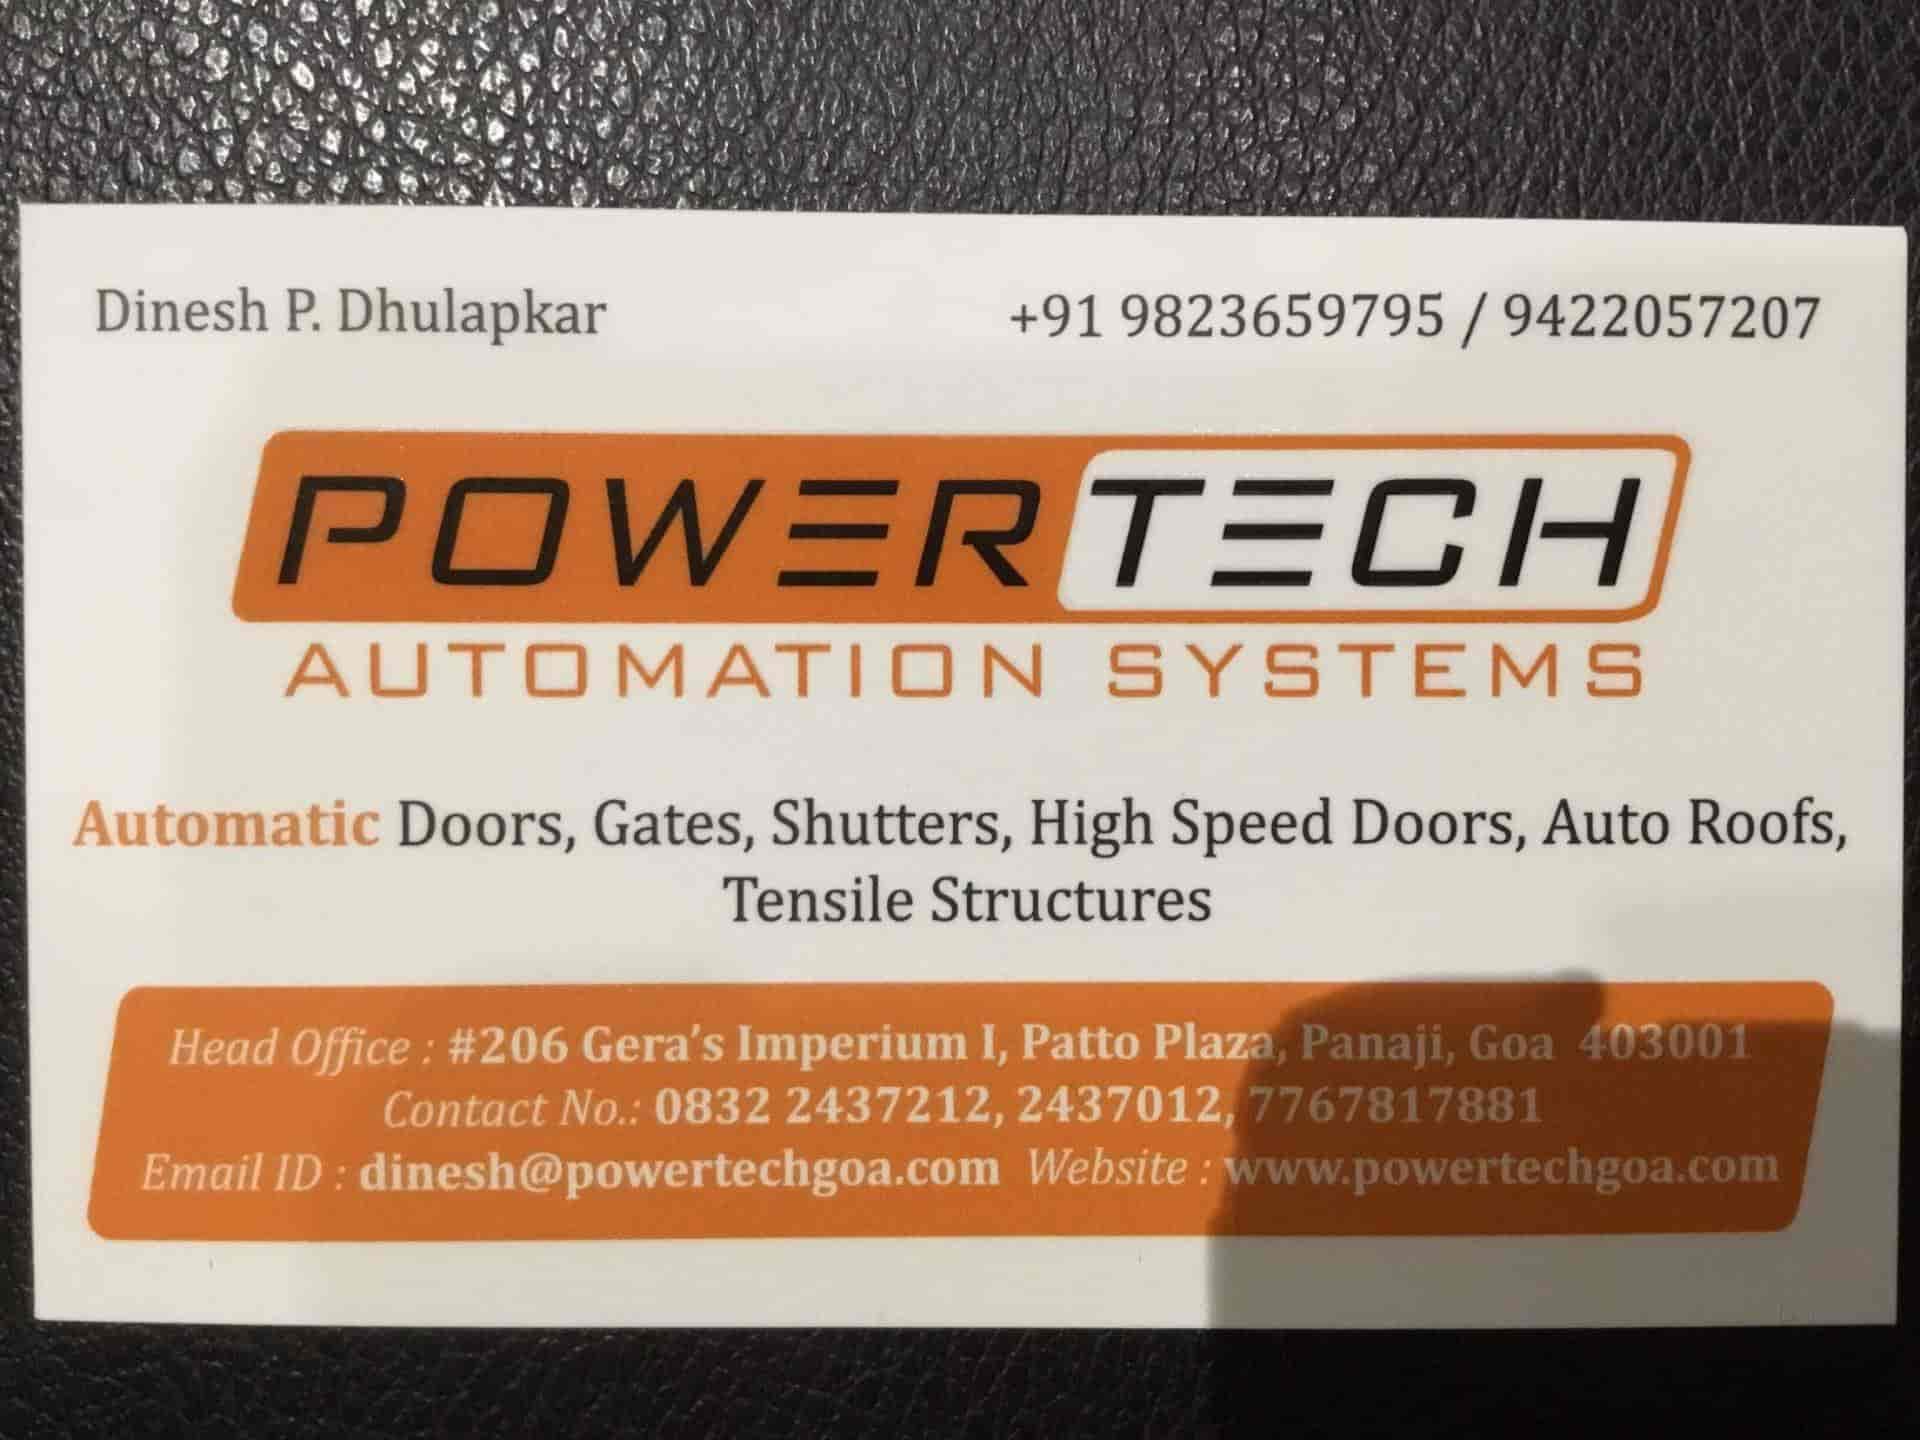 Powertech Automation Systems, Panjim - Biometric Access